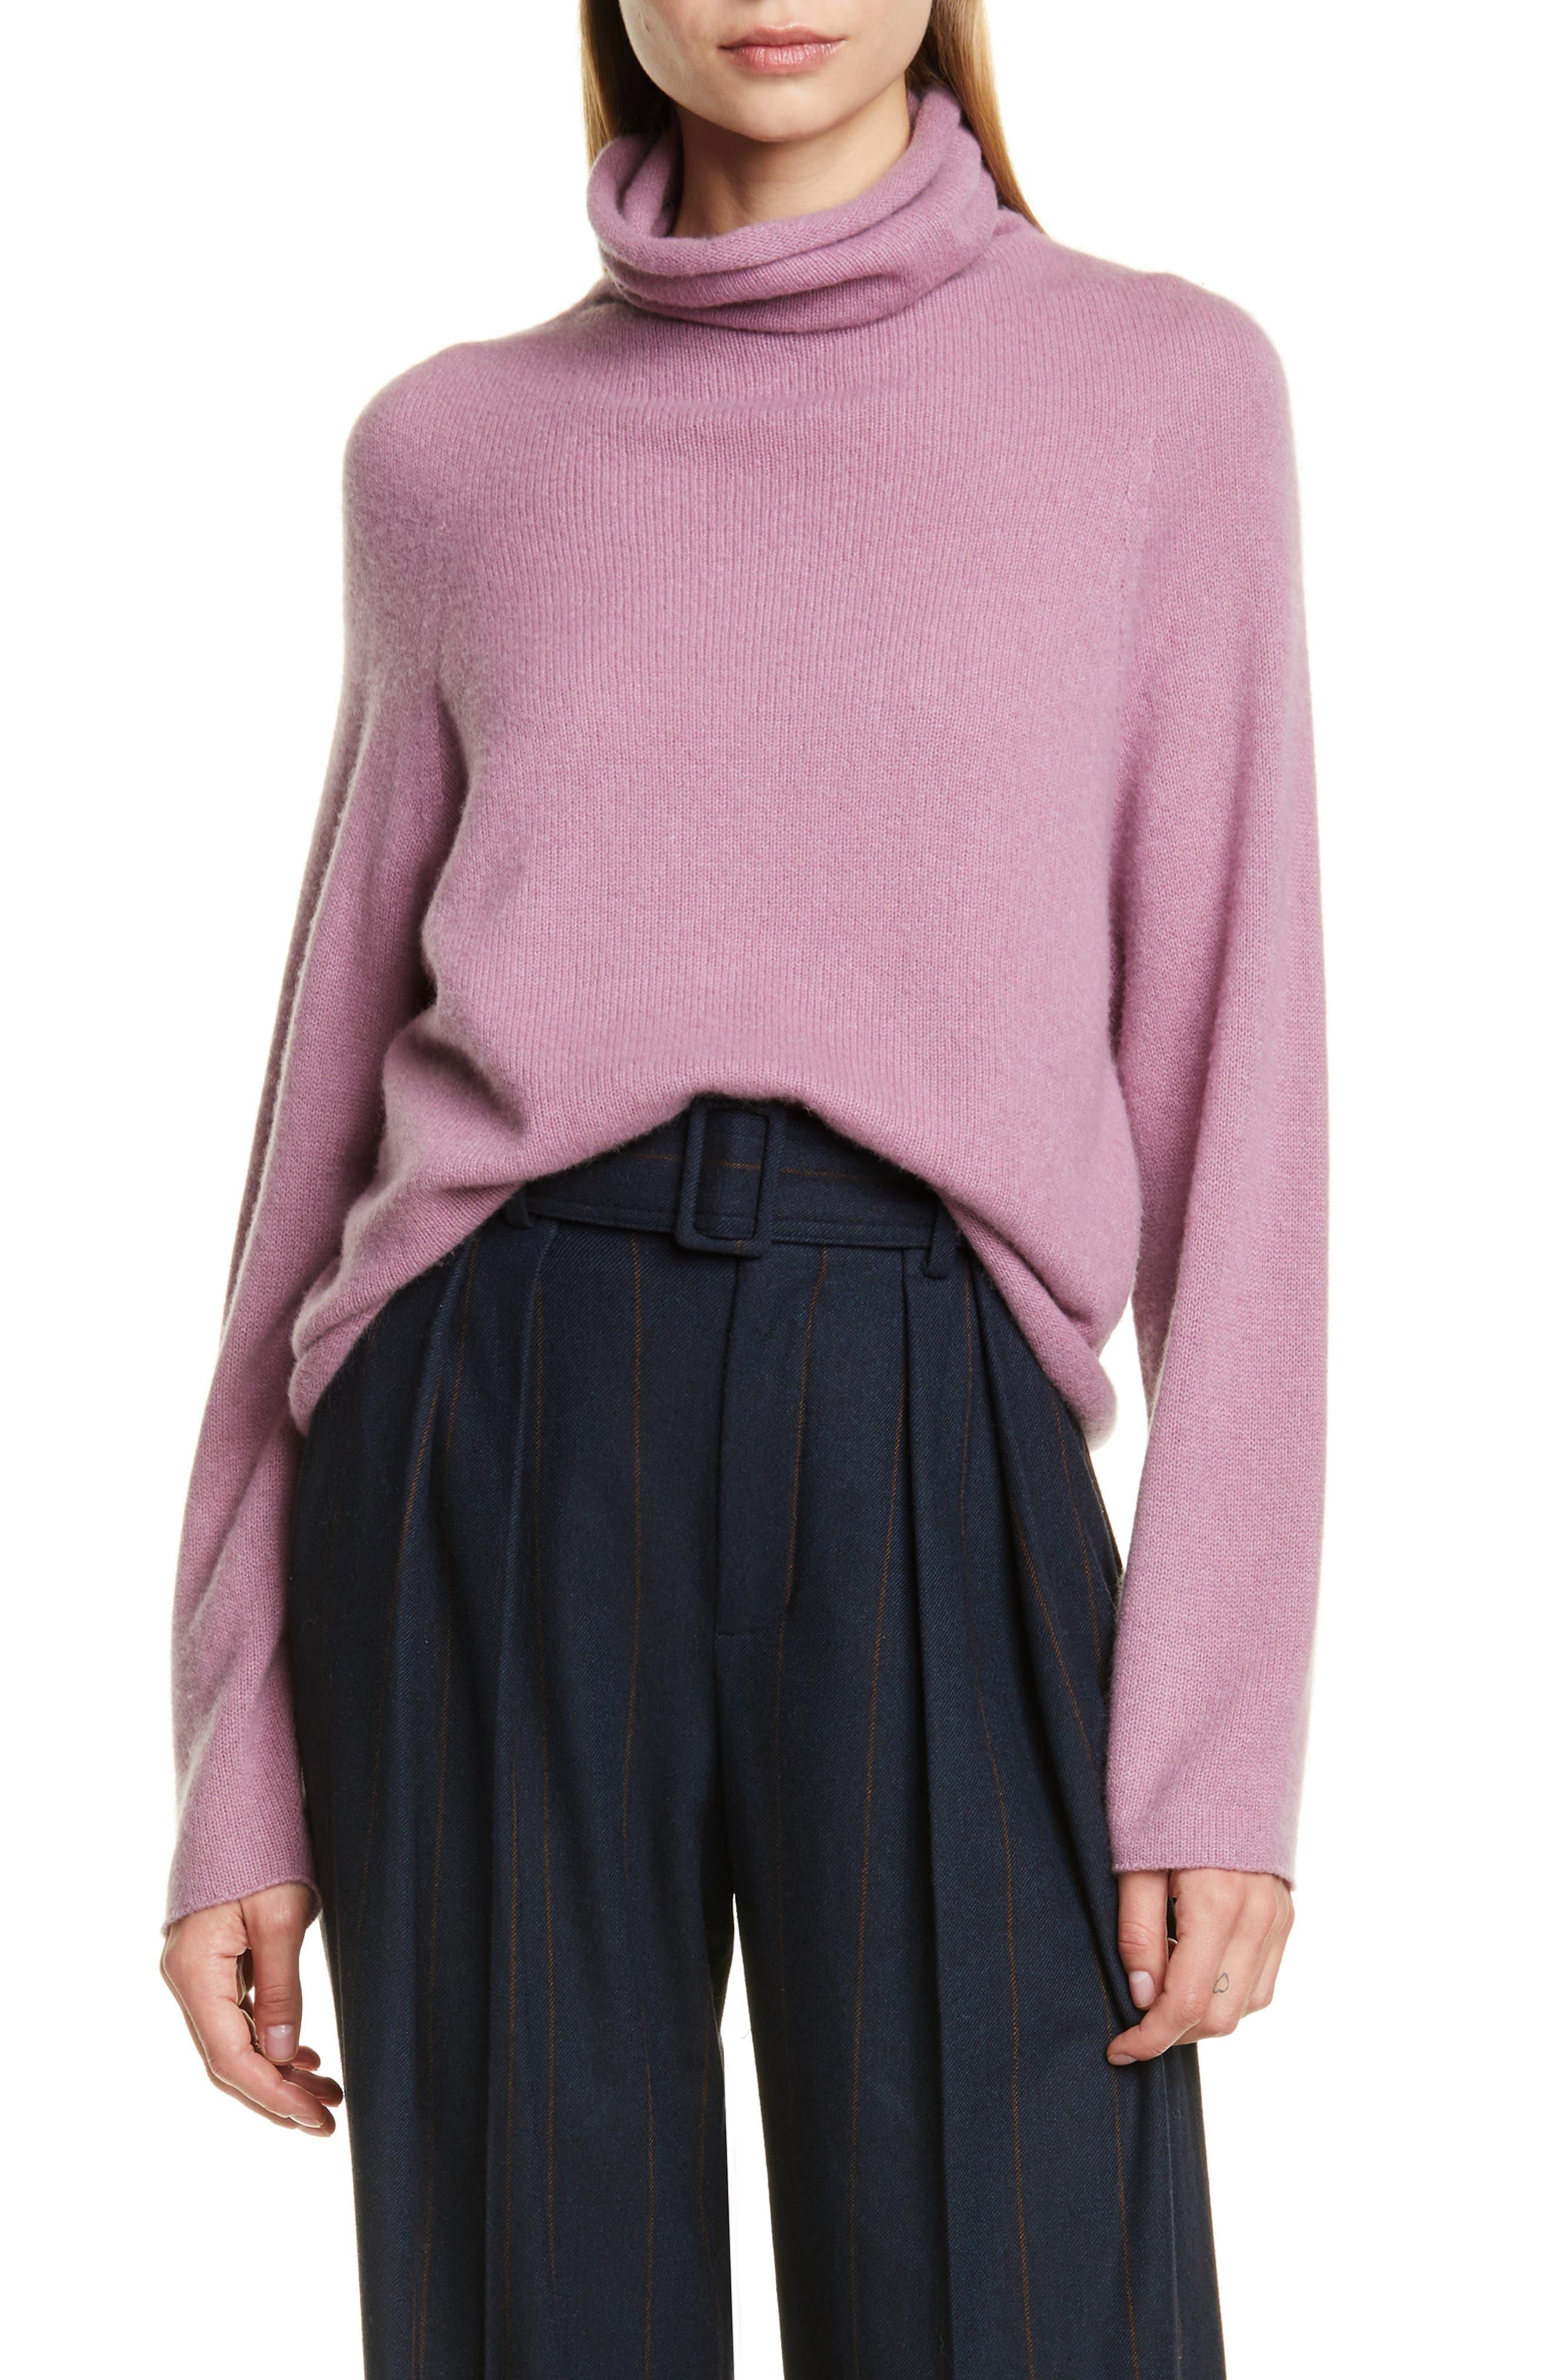 Vince Seamless Cashmere Turtleneck Sweater